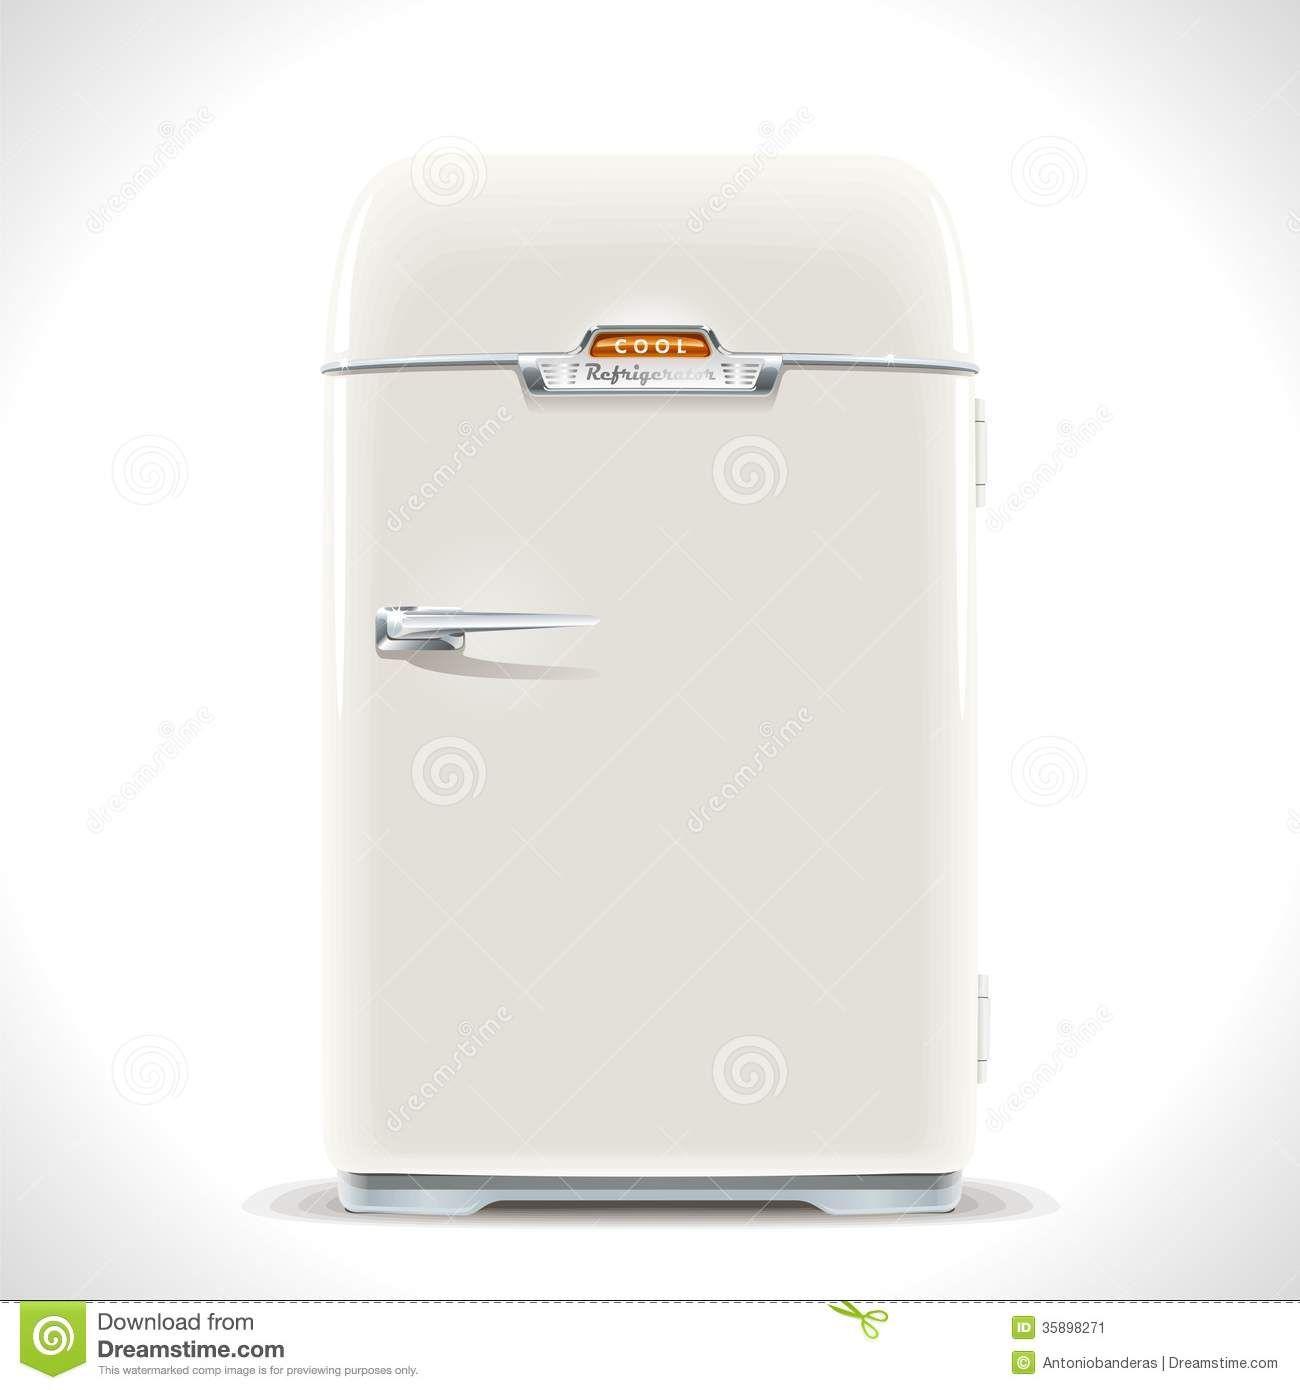 Pin On Retro Refrigeration